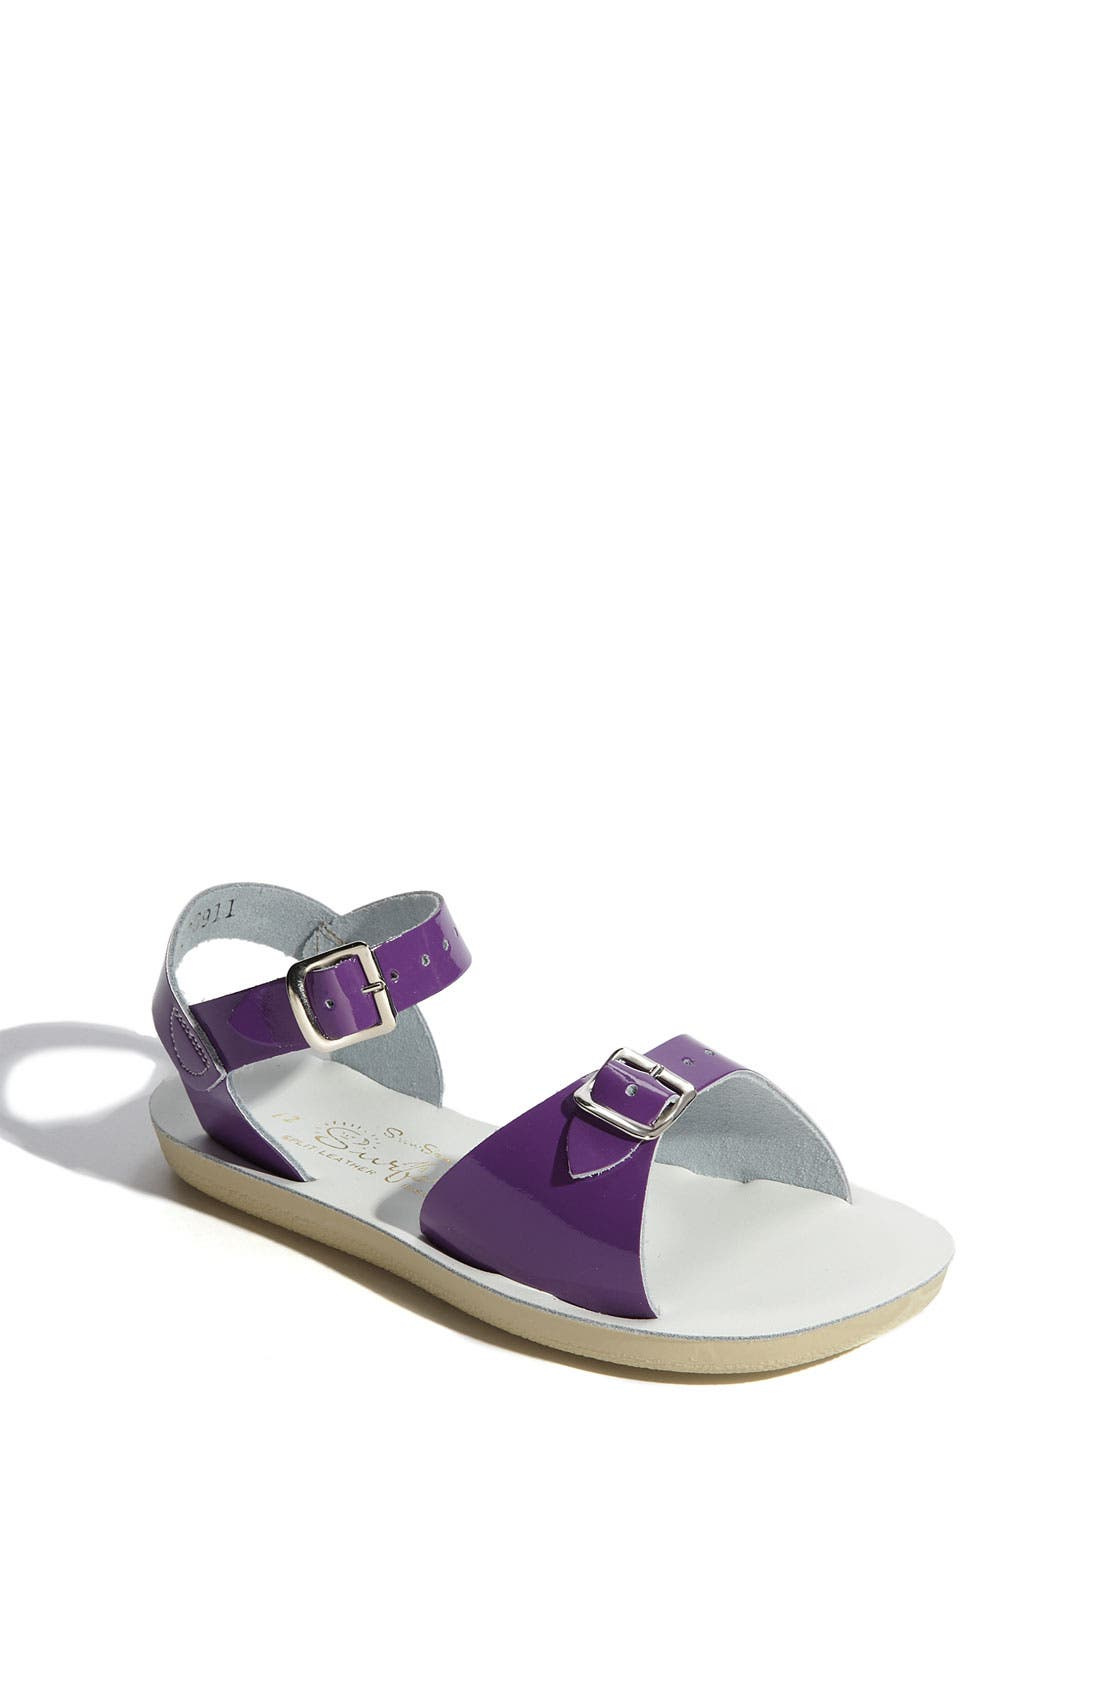 SALT WATER SANDALS BY HOY Surfer Water Friendly Sandal, Main, color, SHINY PURPLE